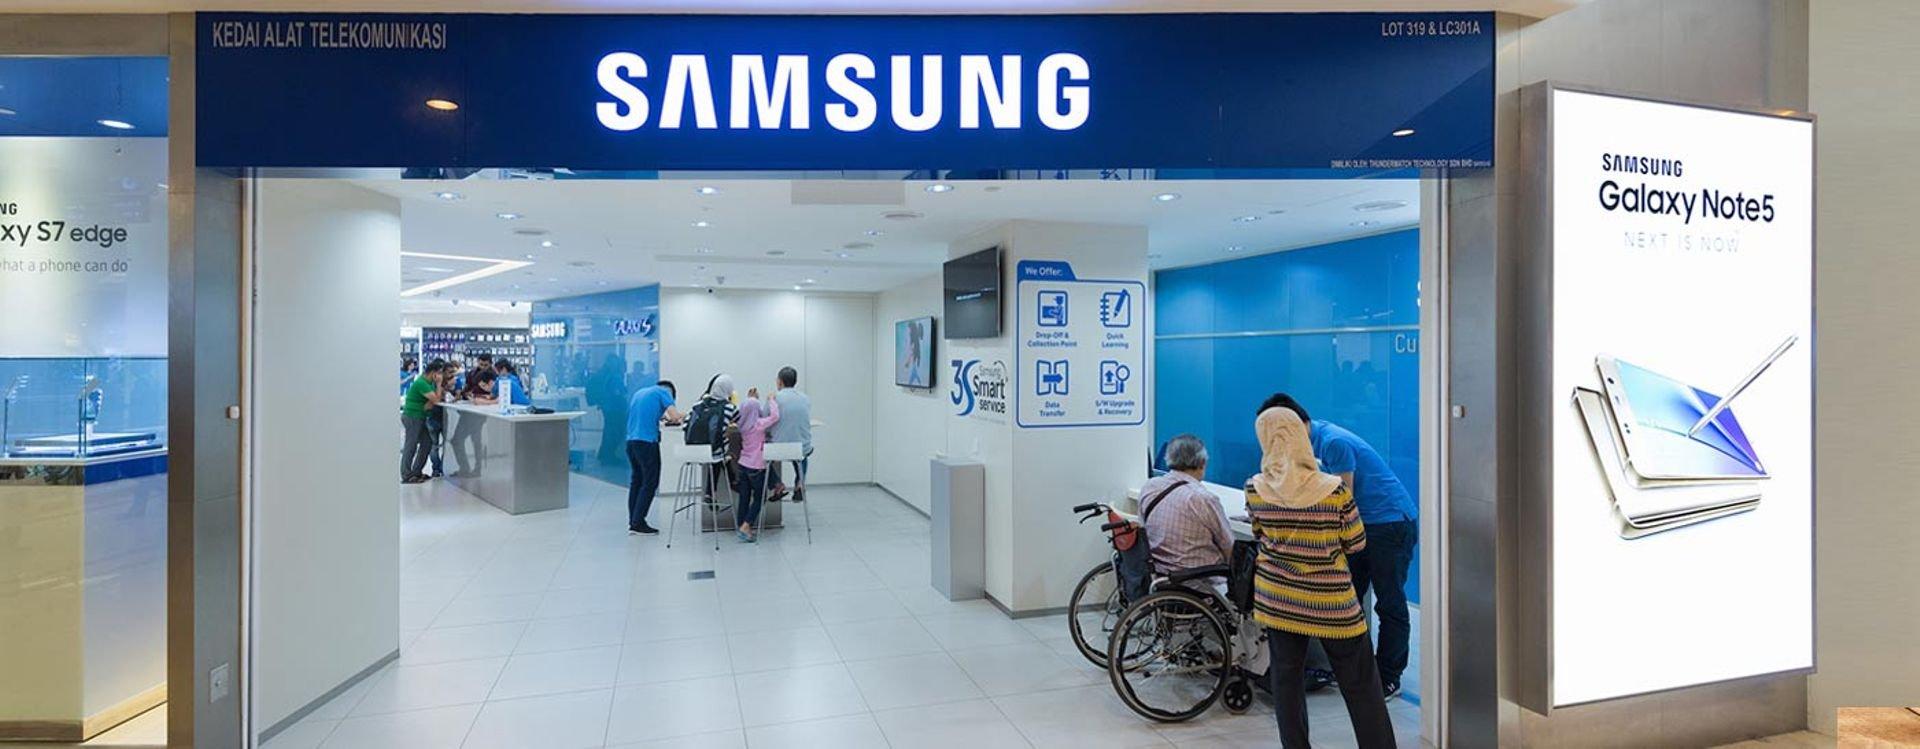 Samsung unveils their new 2017 phones.